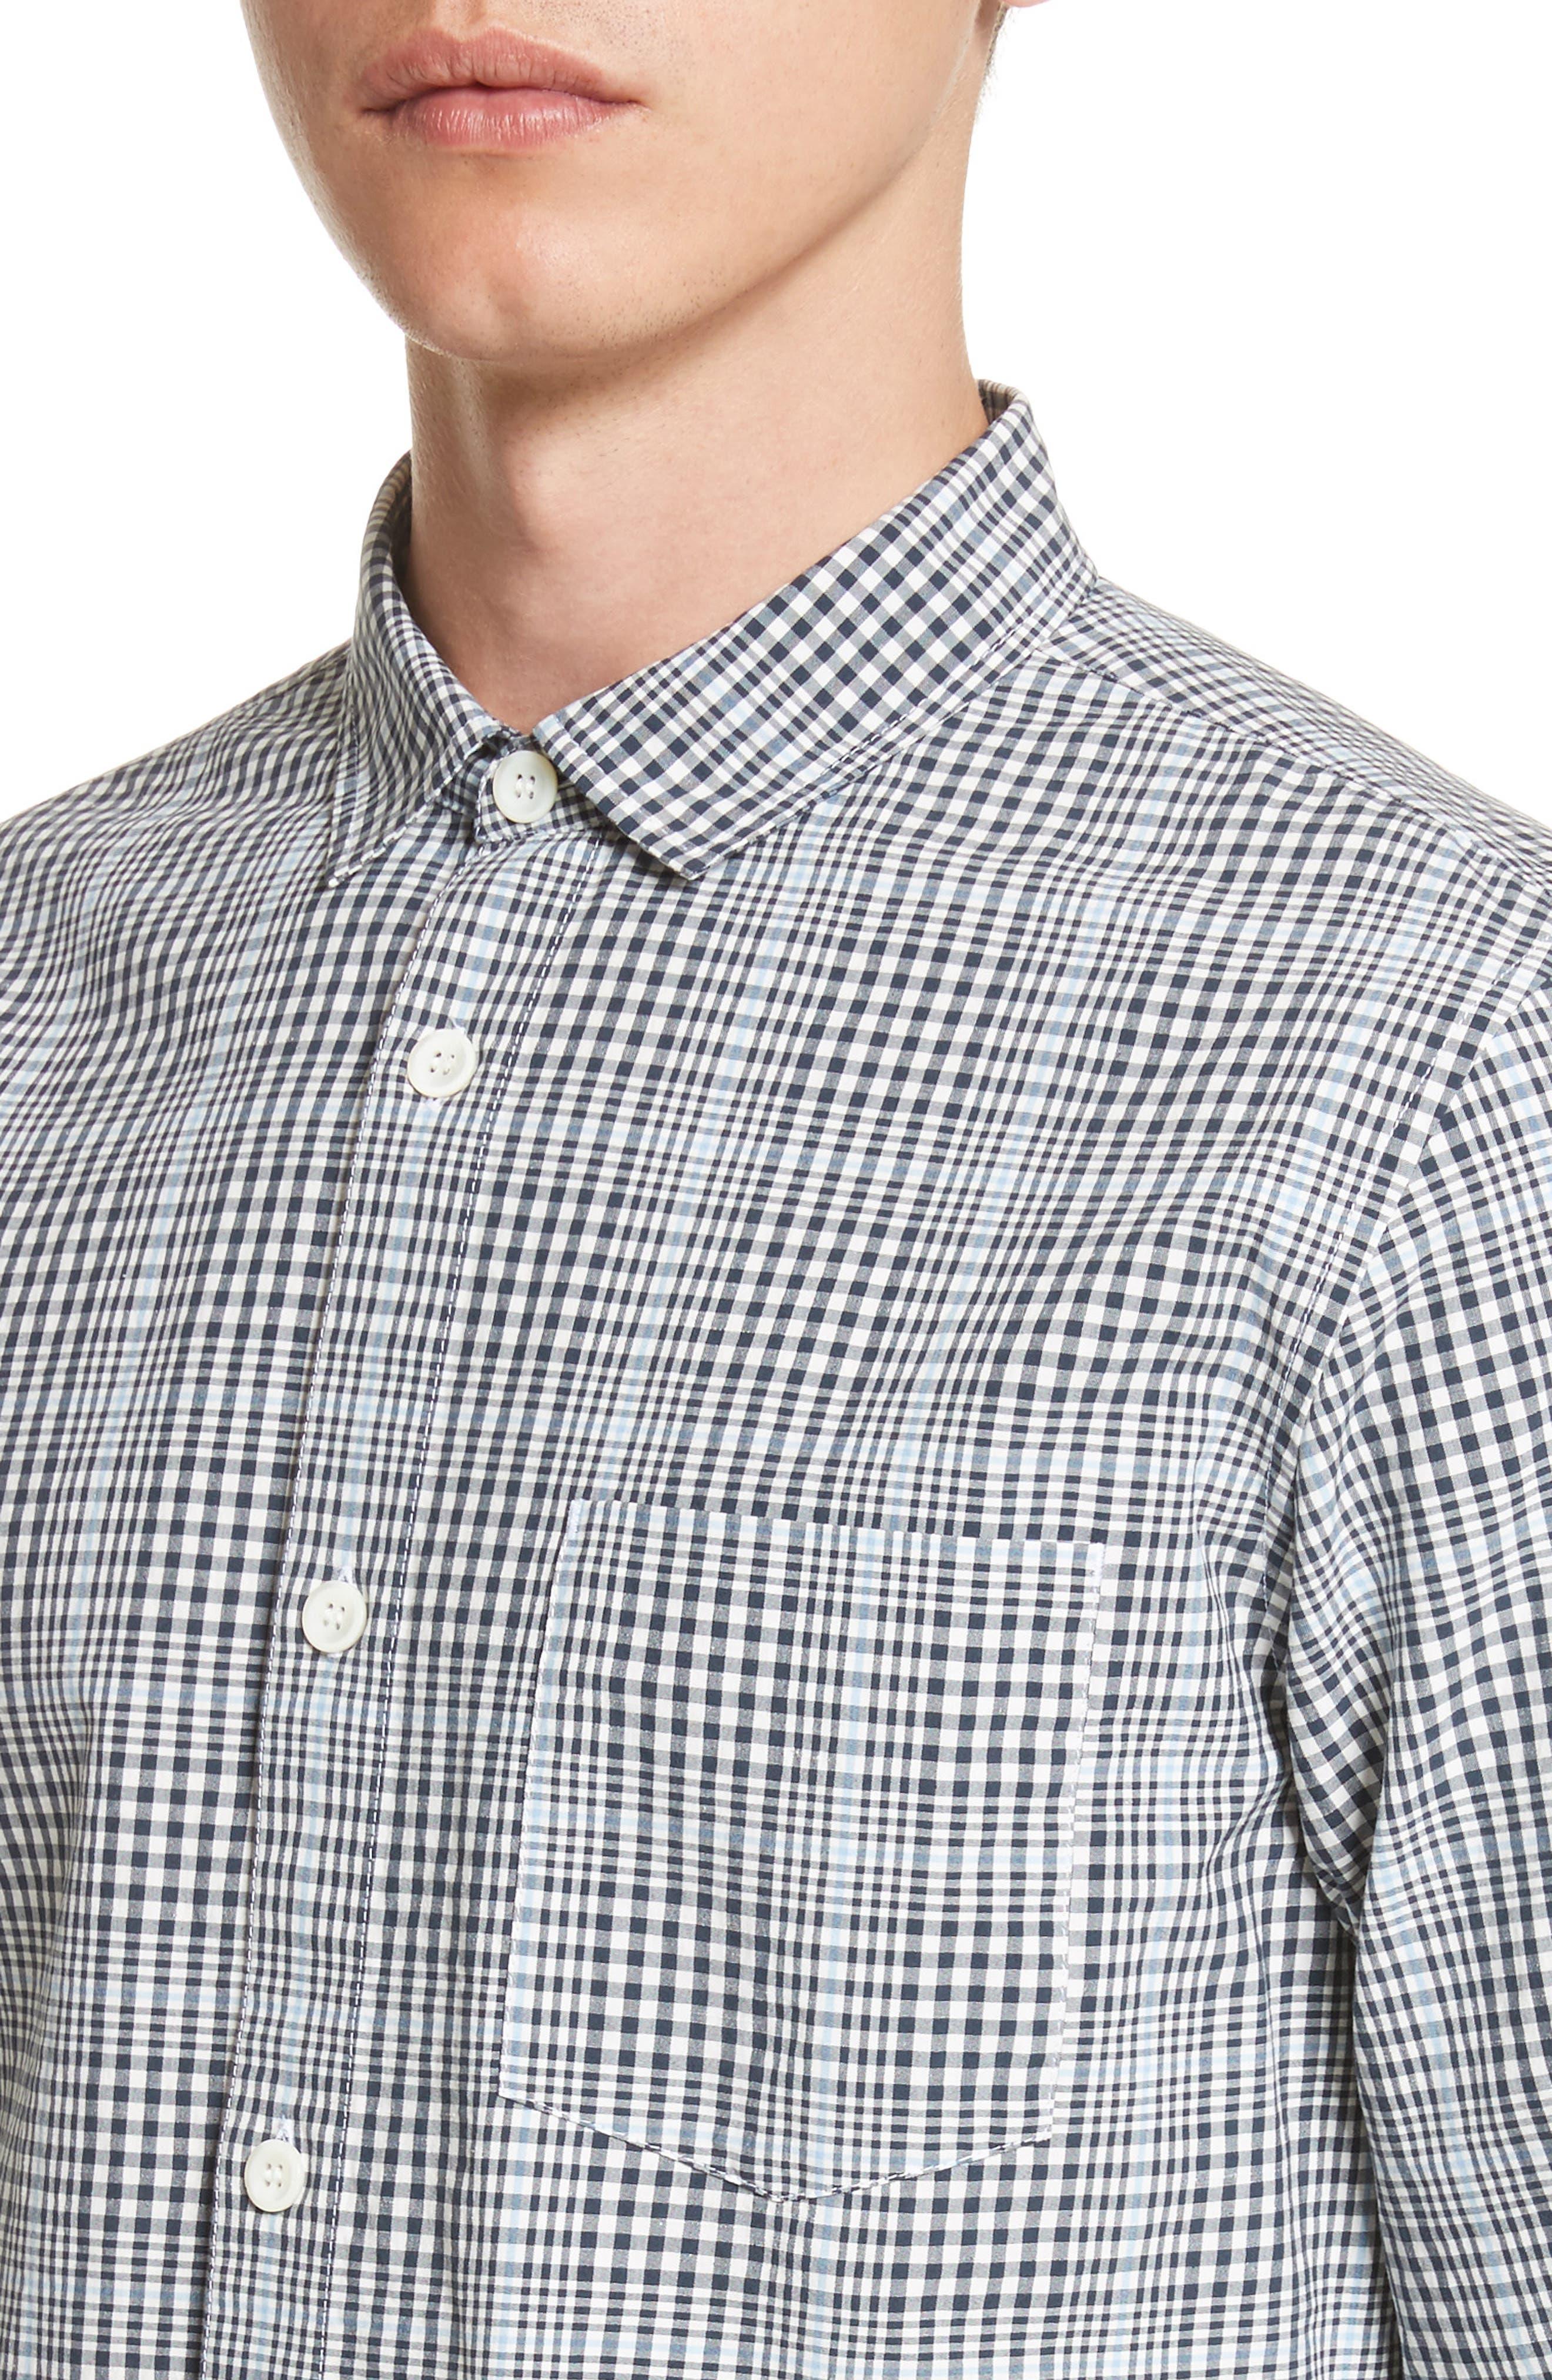 John Check Woven Shirt,                             Alternate thumbnail 4, color,                             410